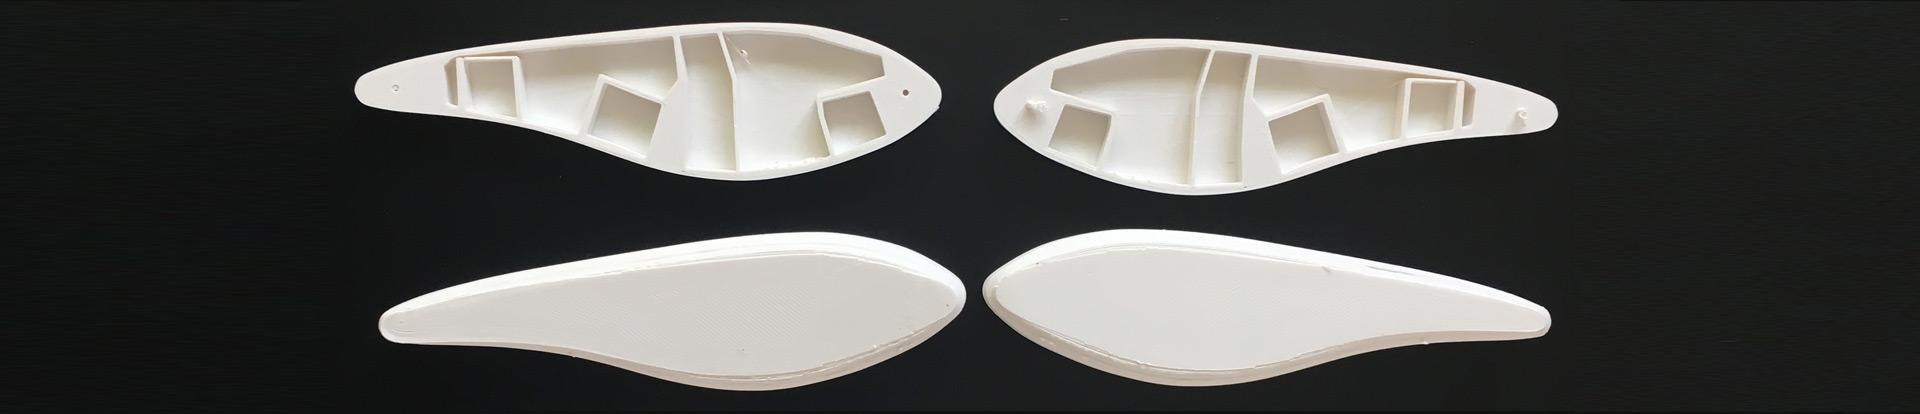 Individuelle Jerkbaits aus dem 3D-Drucker